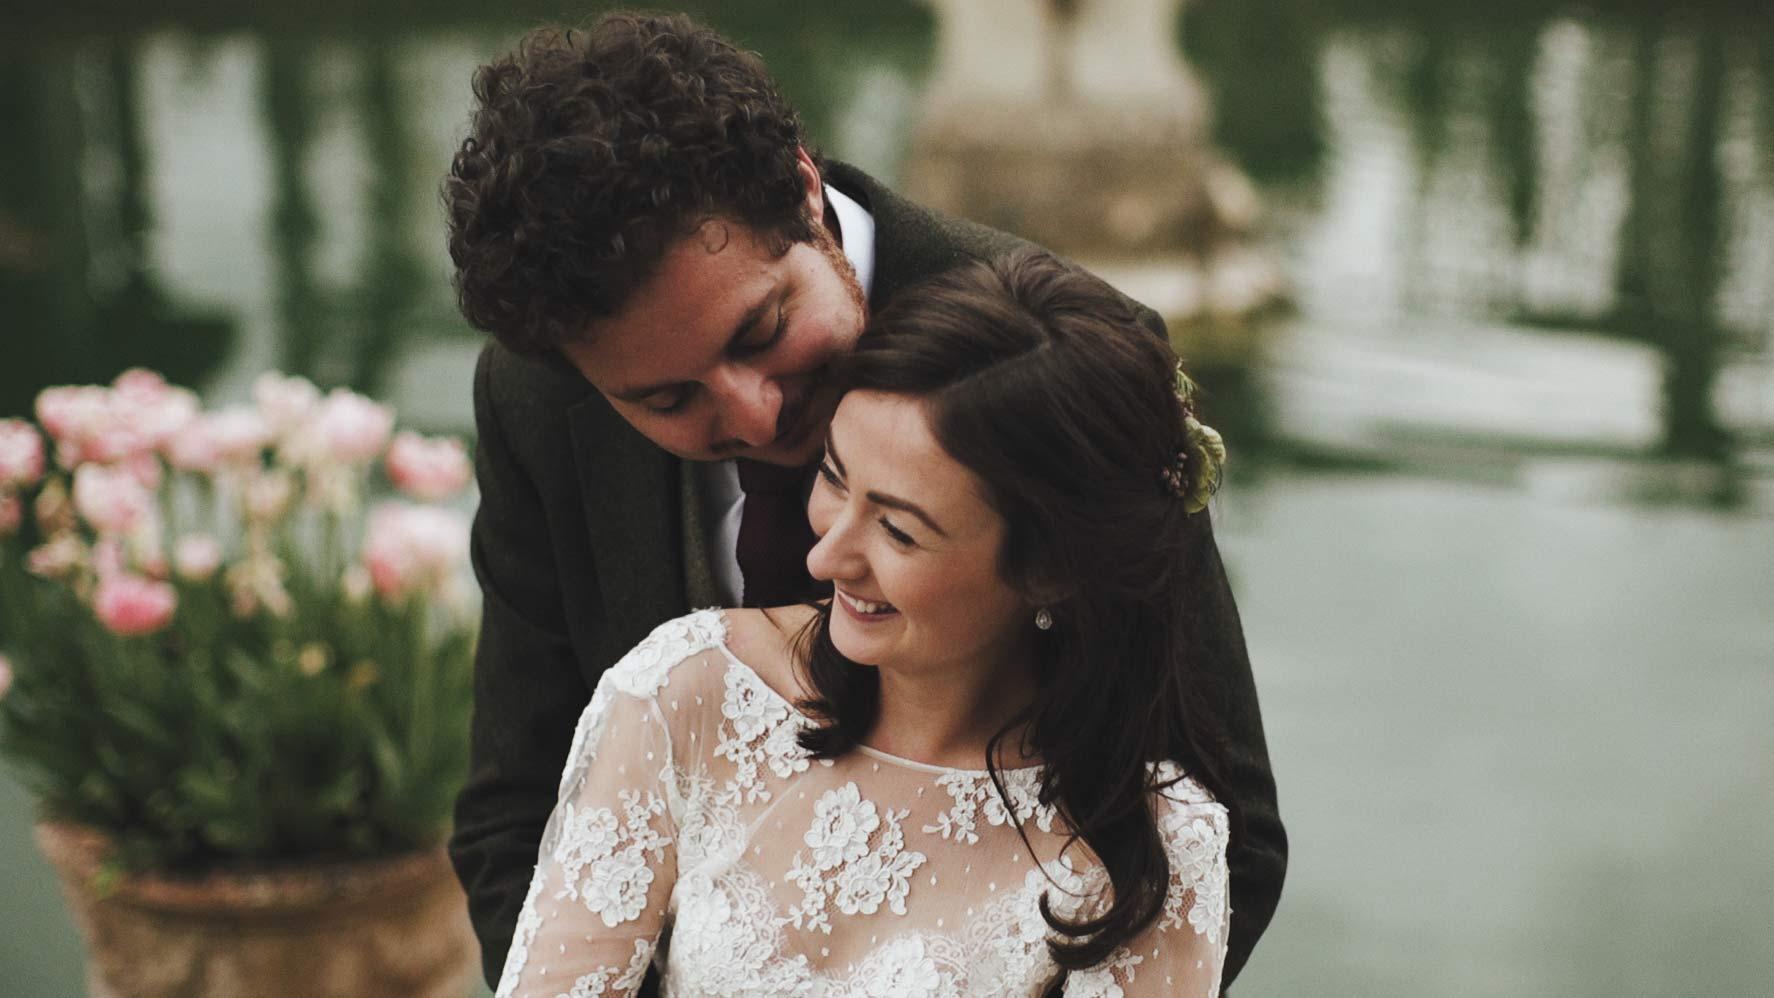 Lost Orangery Wedding Video in Wiltshire | Euridge Manor